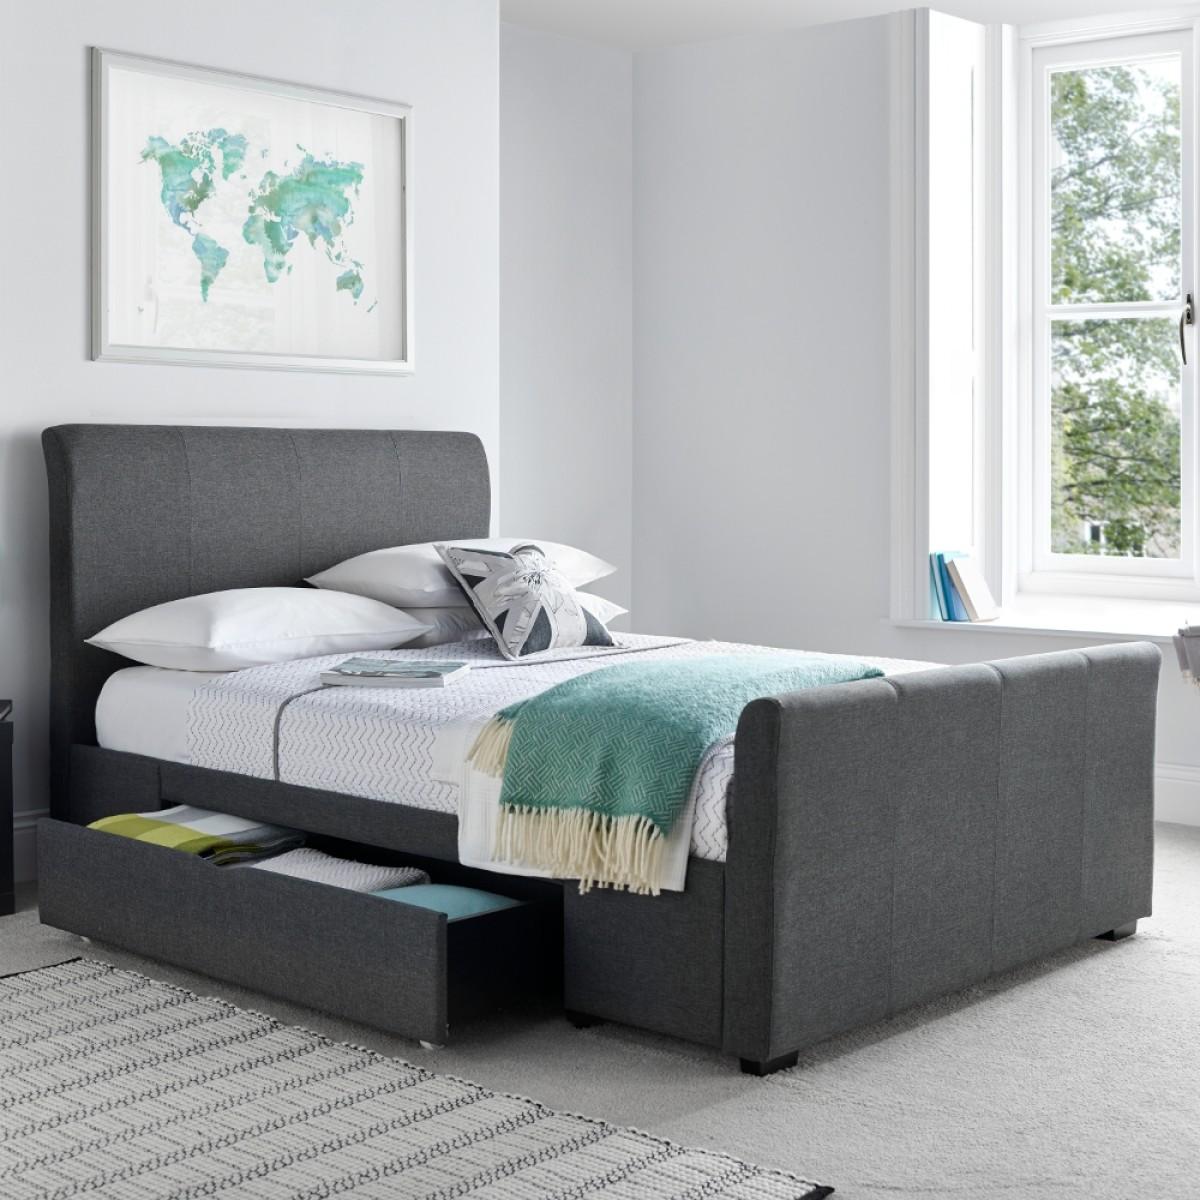 Hexham Grey Fabric 2 Drawer Storage Bed